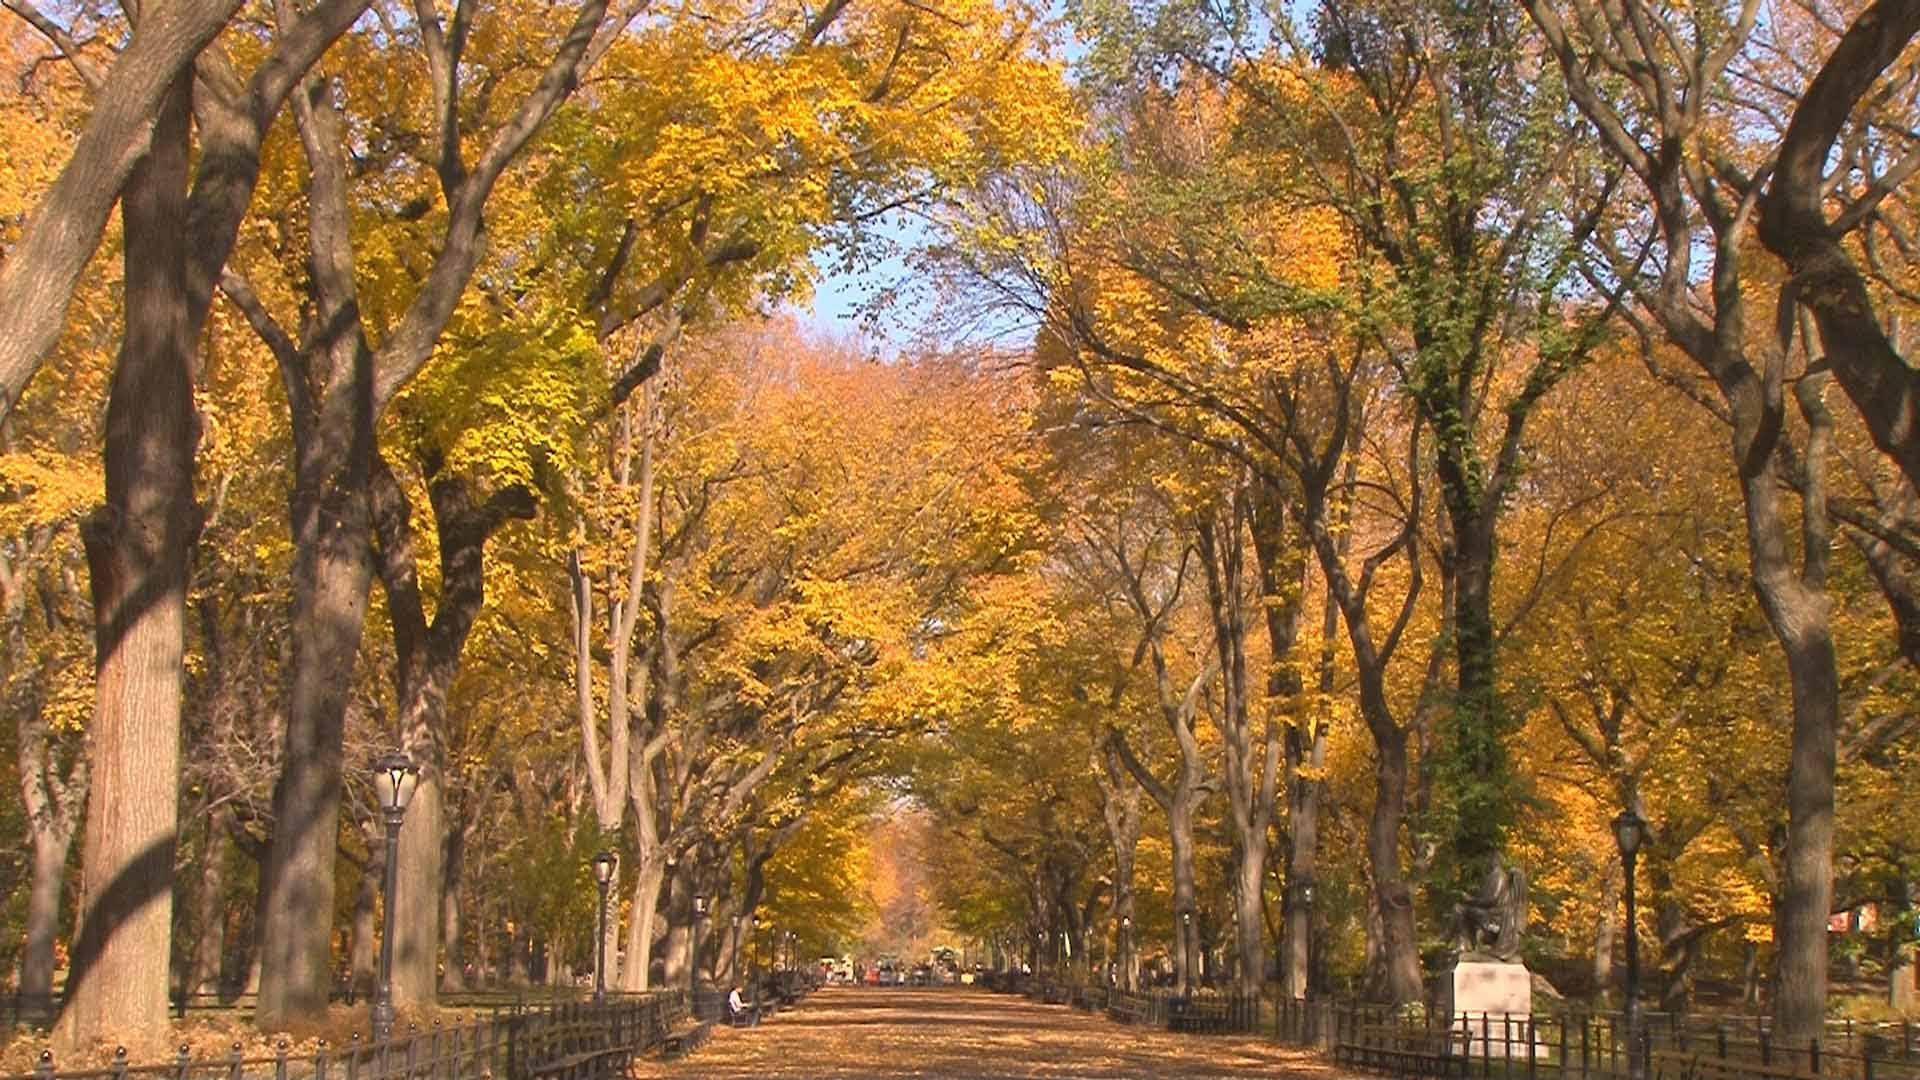 Central Park NYC Peak Fall Foliage  November 2011 1920x1080